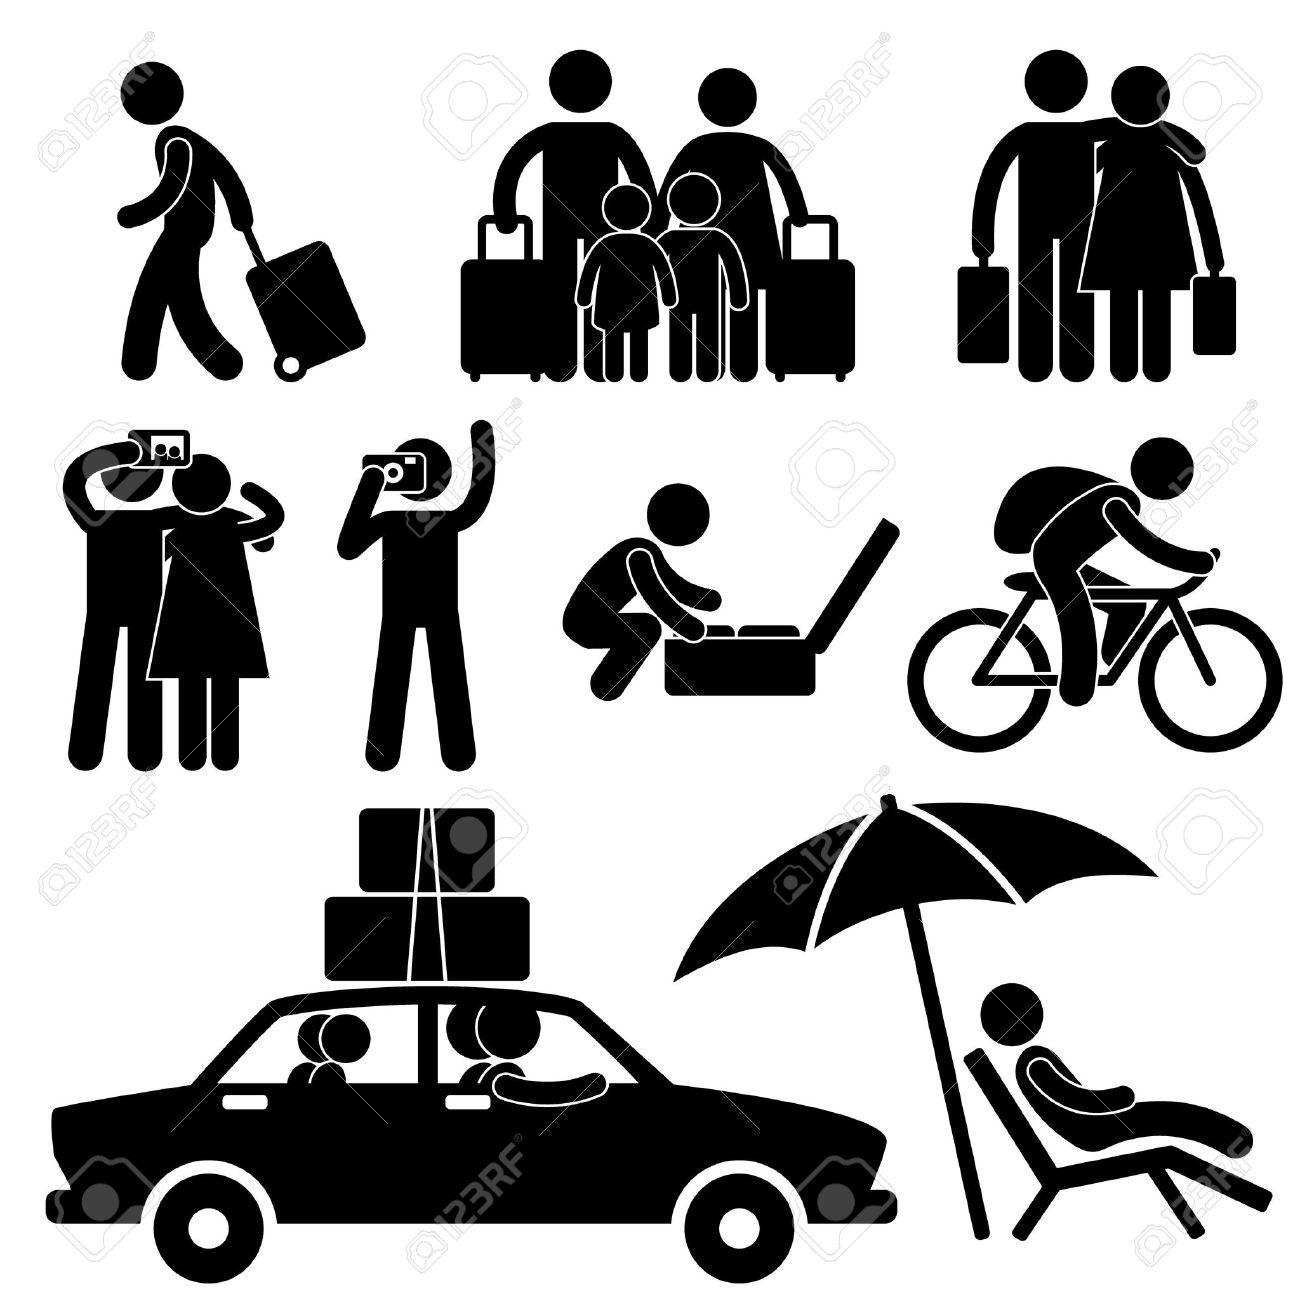 Family Couple Tourist Travel Vacation Trip Holiday Honeymoon Icon Symbol Sign Pictogram - 11965736